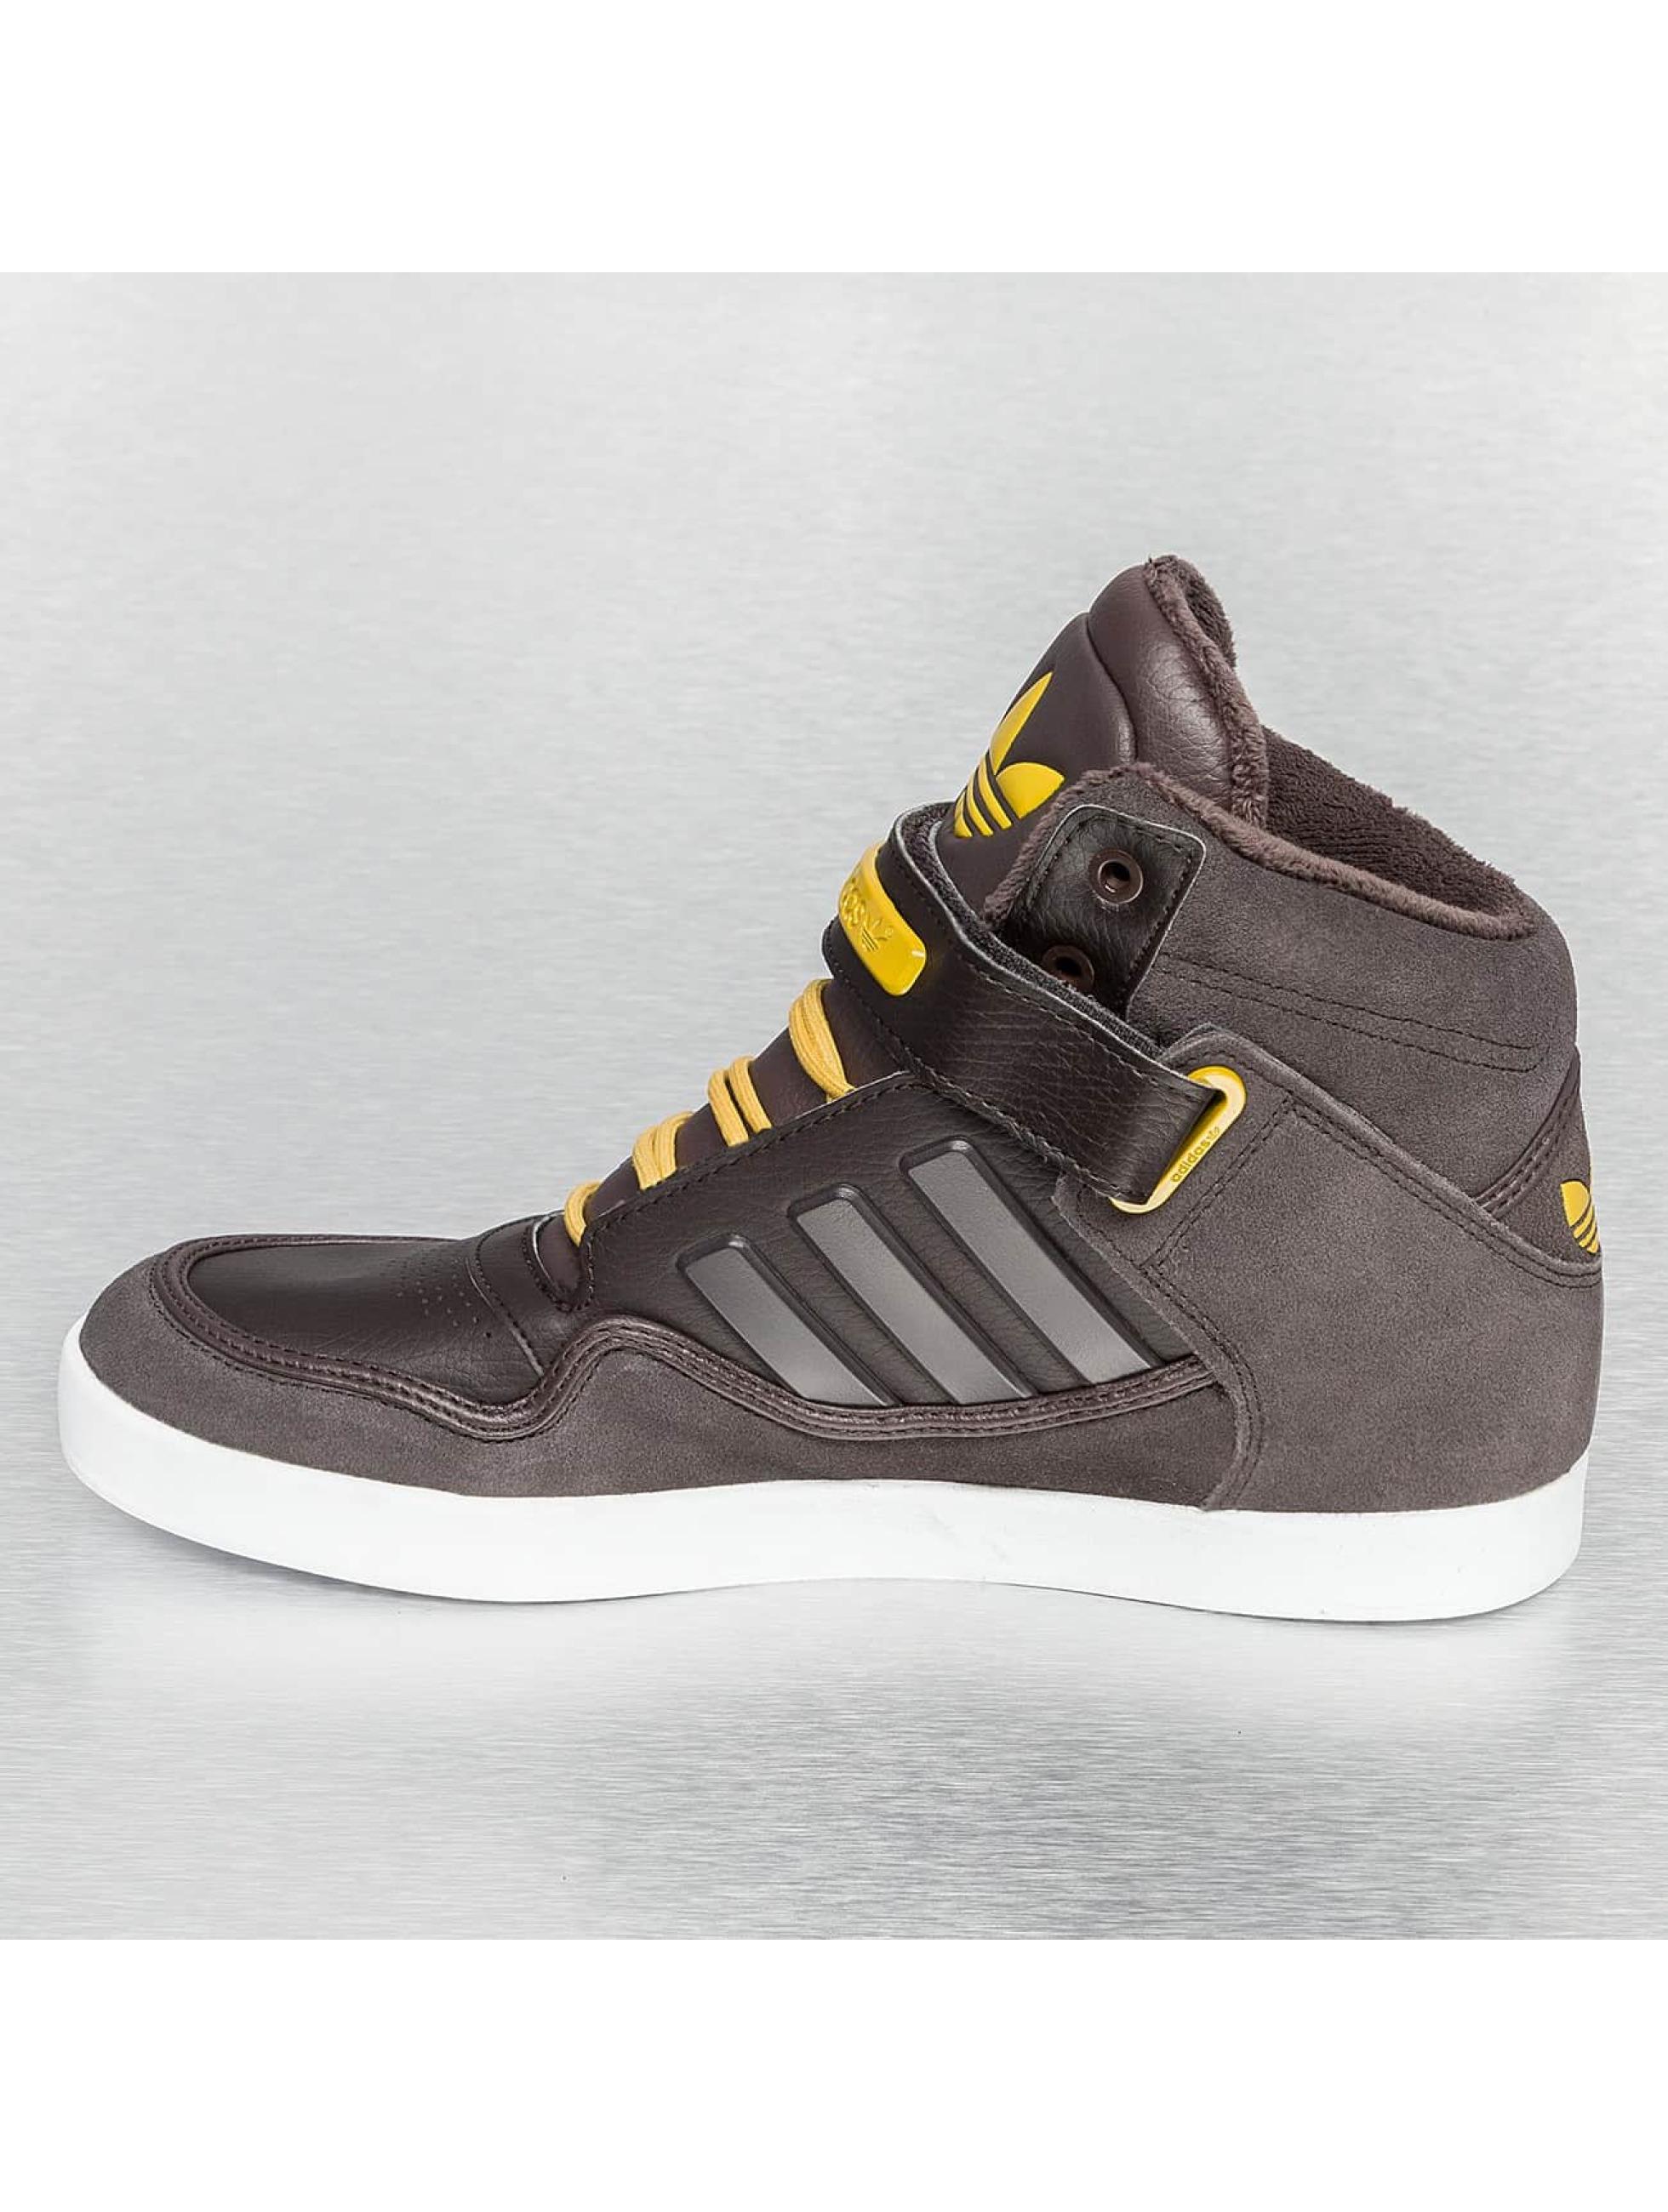 Adidas Originals Sneaker Braun